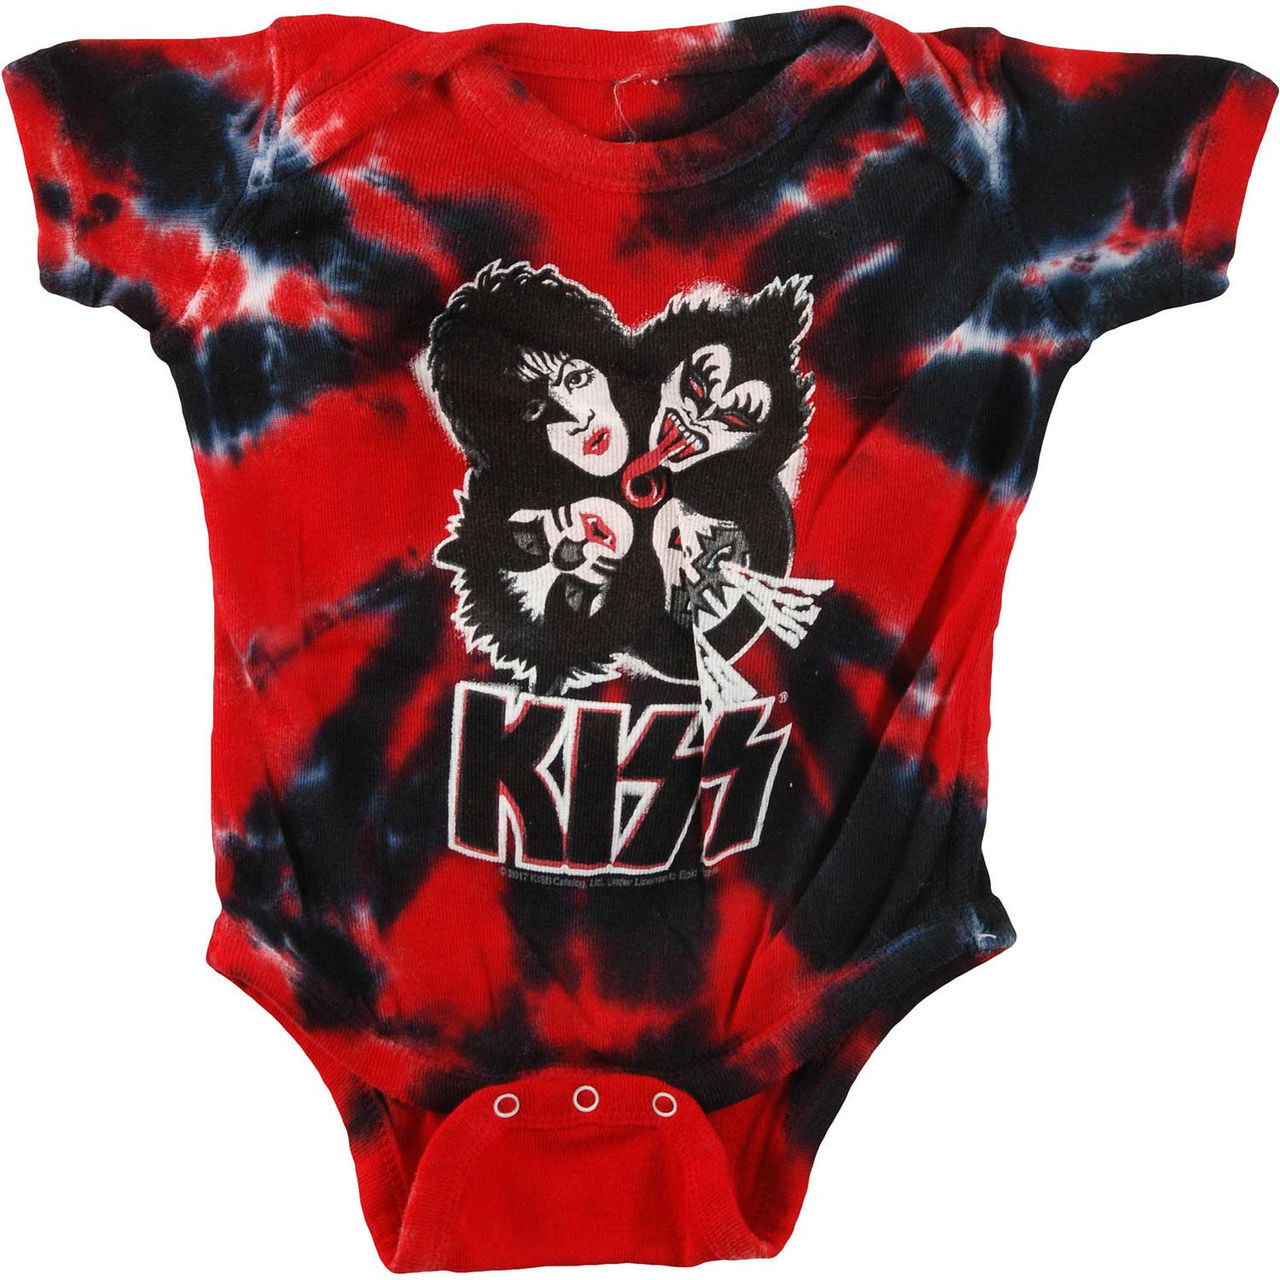 29d34120bd3731 Kiss Burst Baby One Piece Romper Toddler 6-8 Months Red Black Tie Dye  Bodysuit - Fearless Apparel